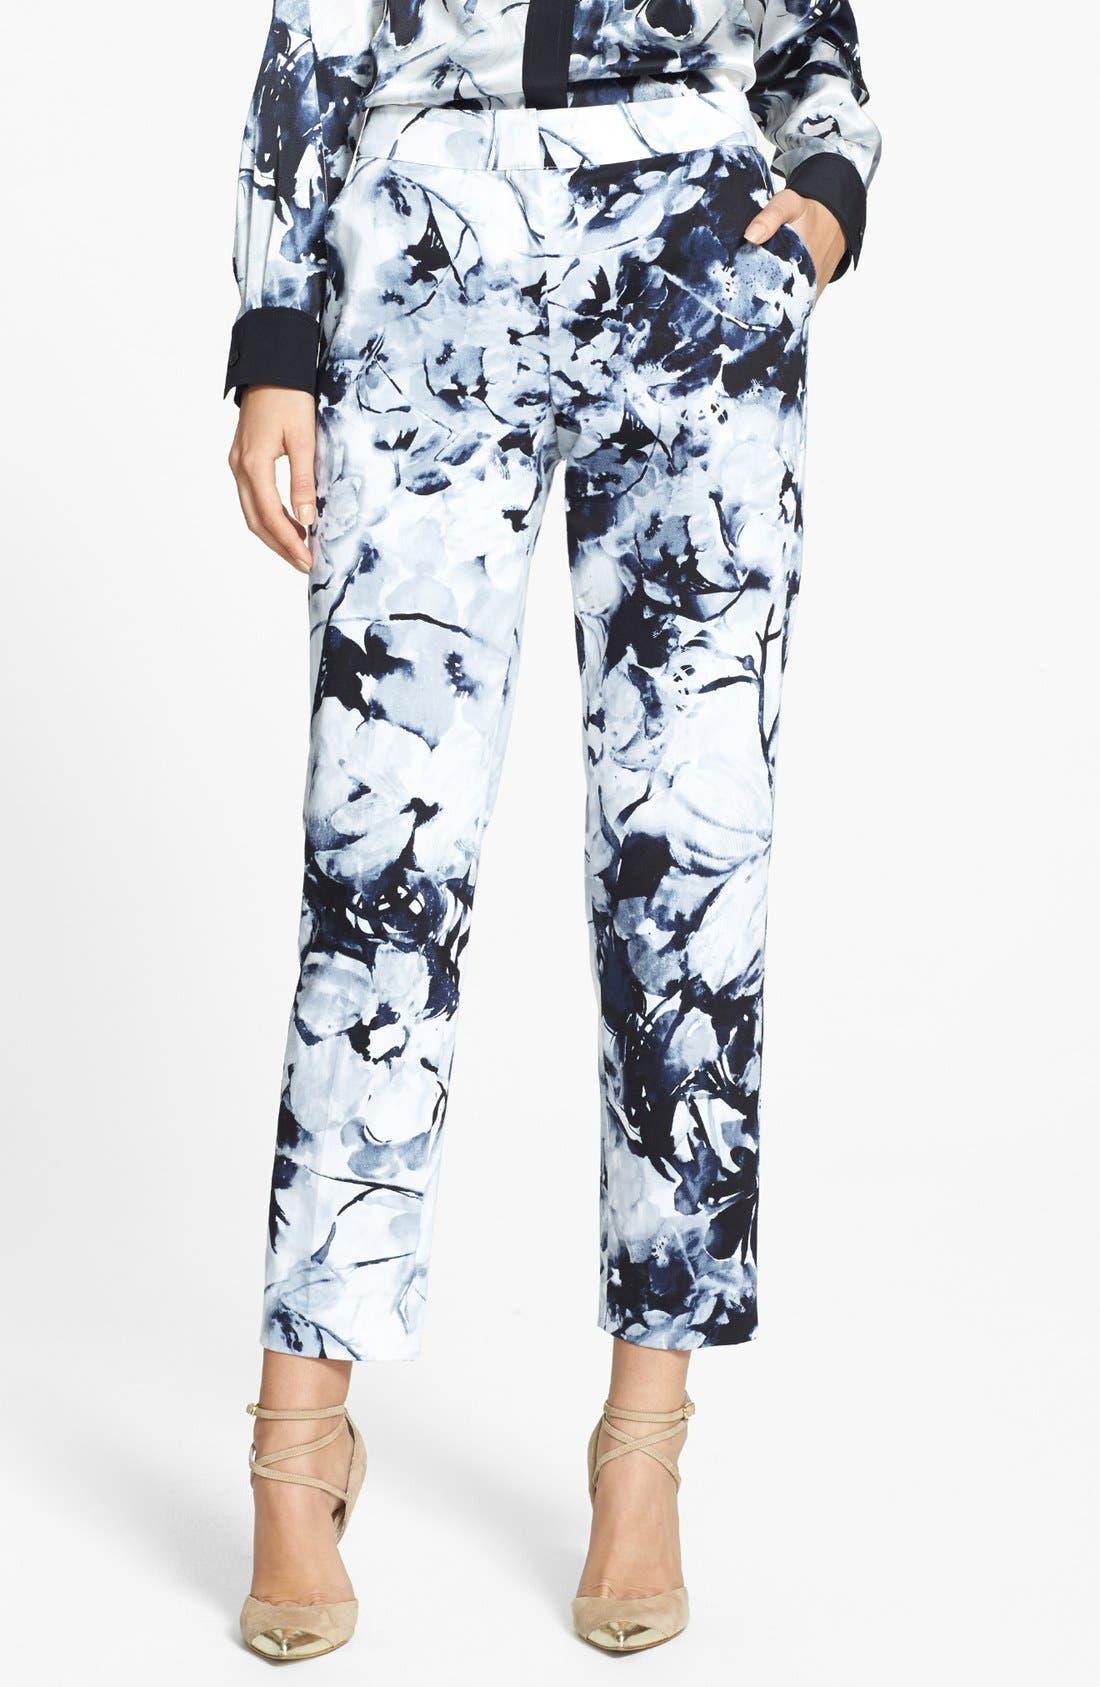 Alternate Image 1 Selected - St. John Yellow Label 'Emma' Floral Print Cotton Sateen Crop Pants